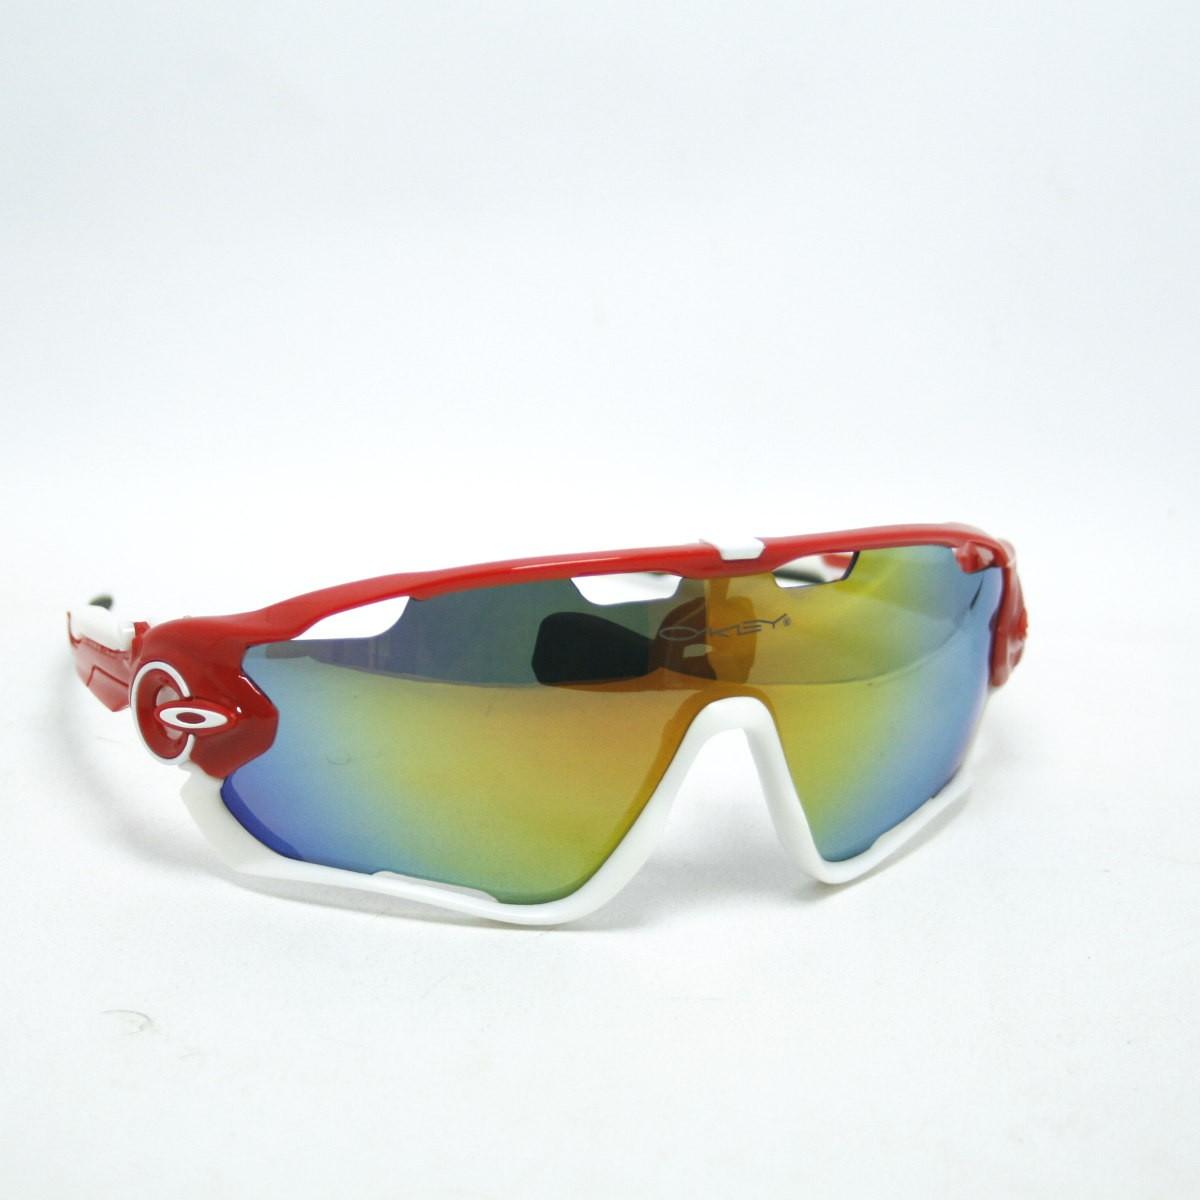 Óculos Oakley Jawbreaker Polarizado 5 Lentes Vermelho/branco